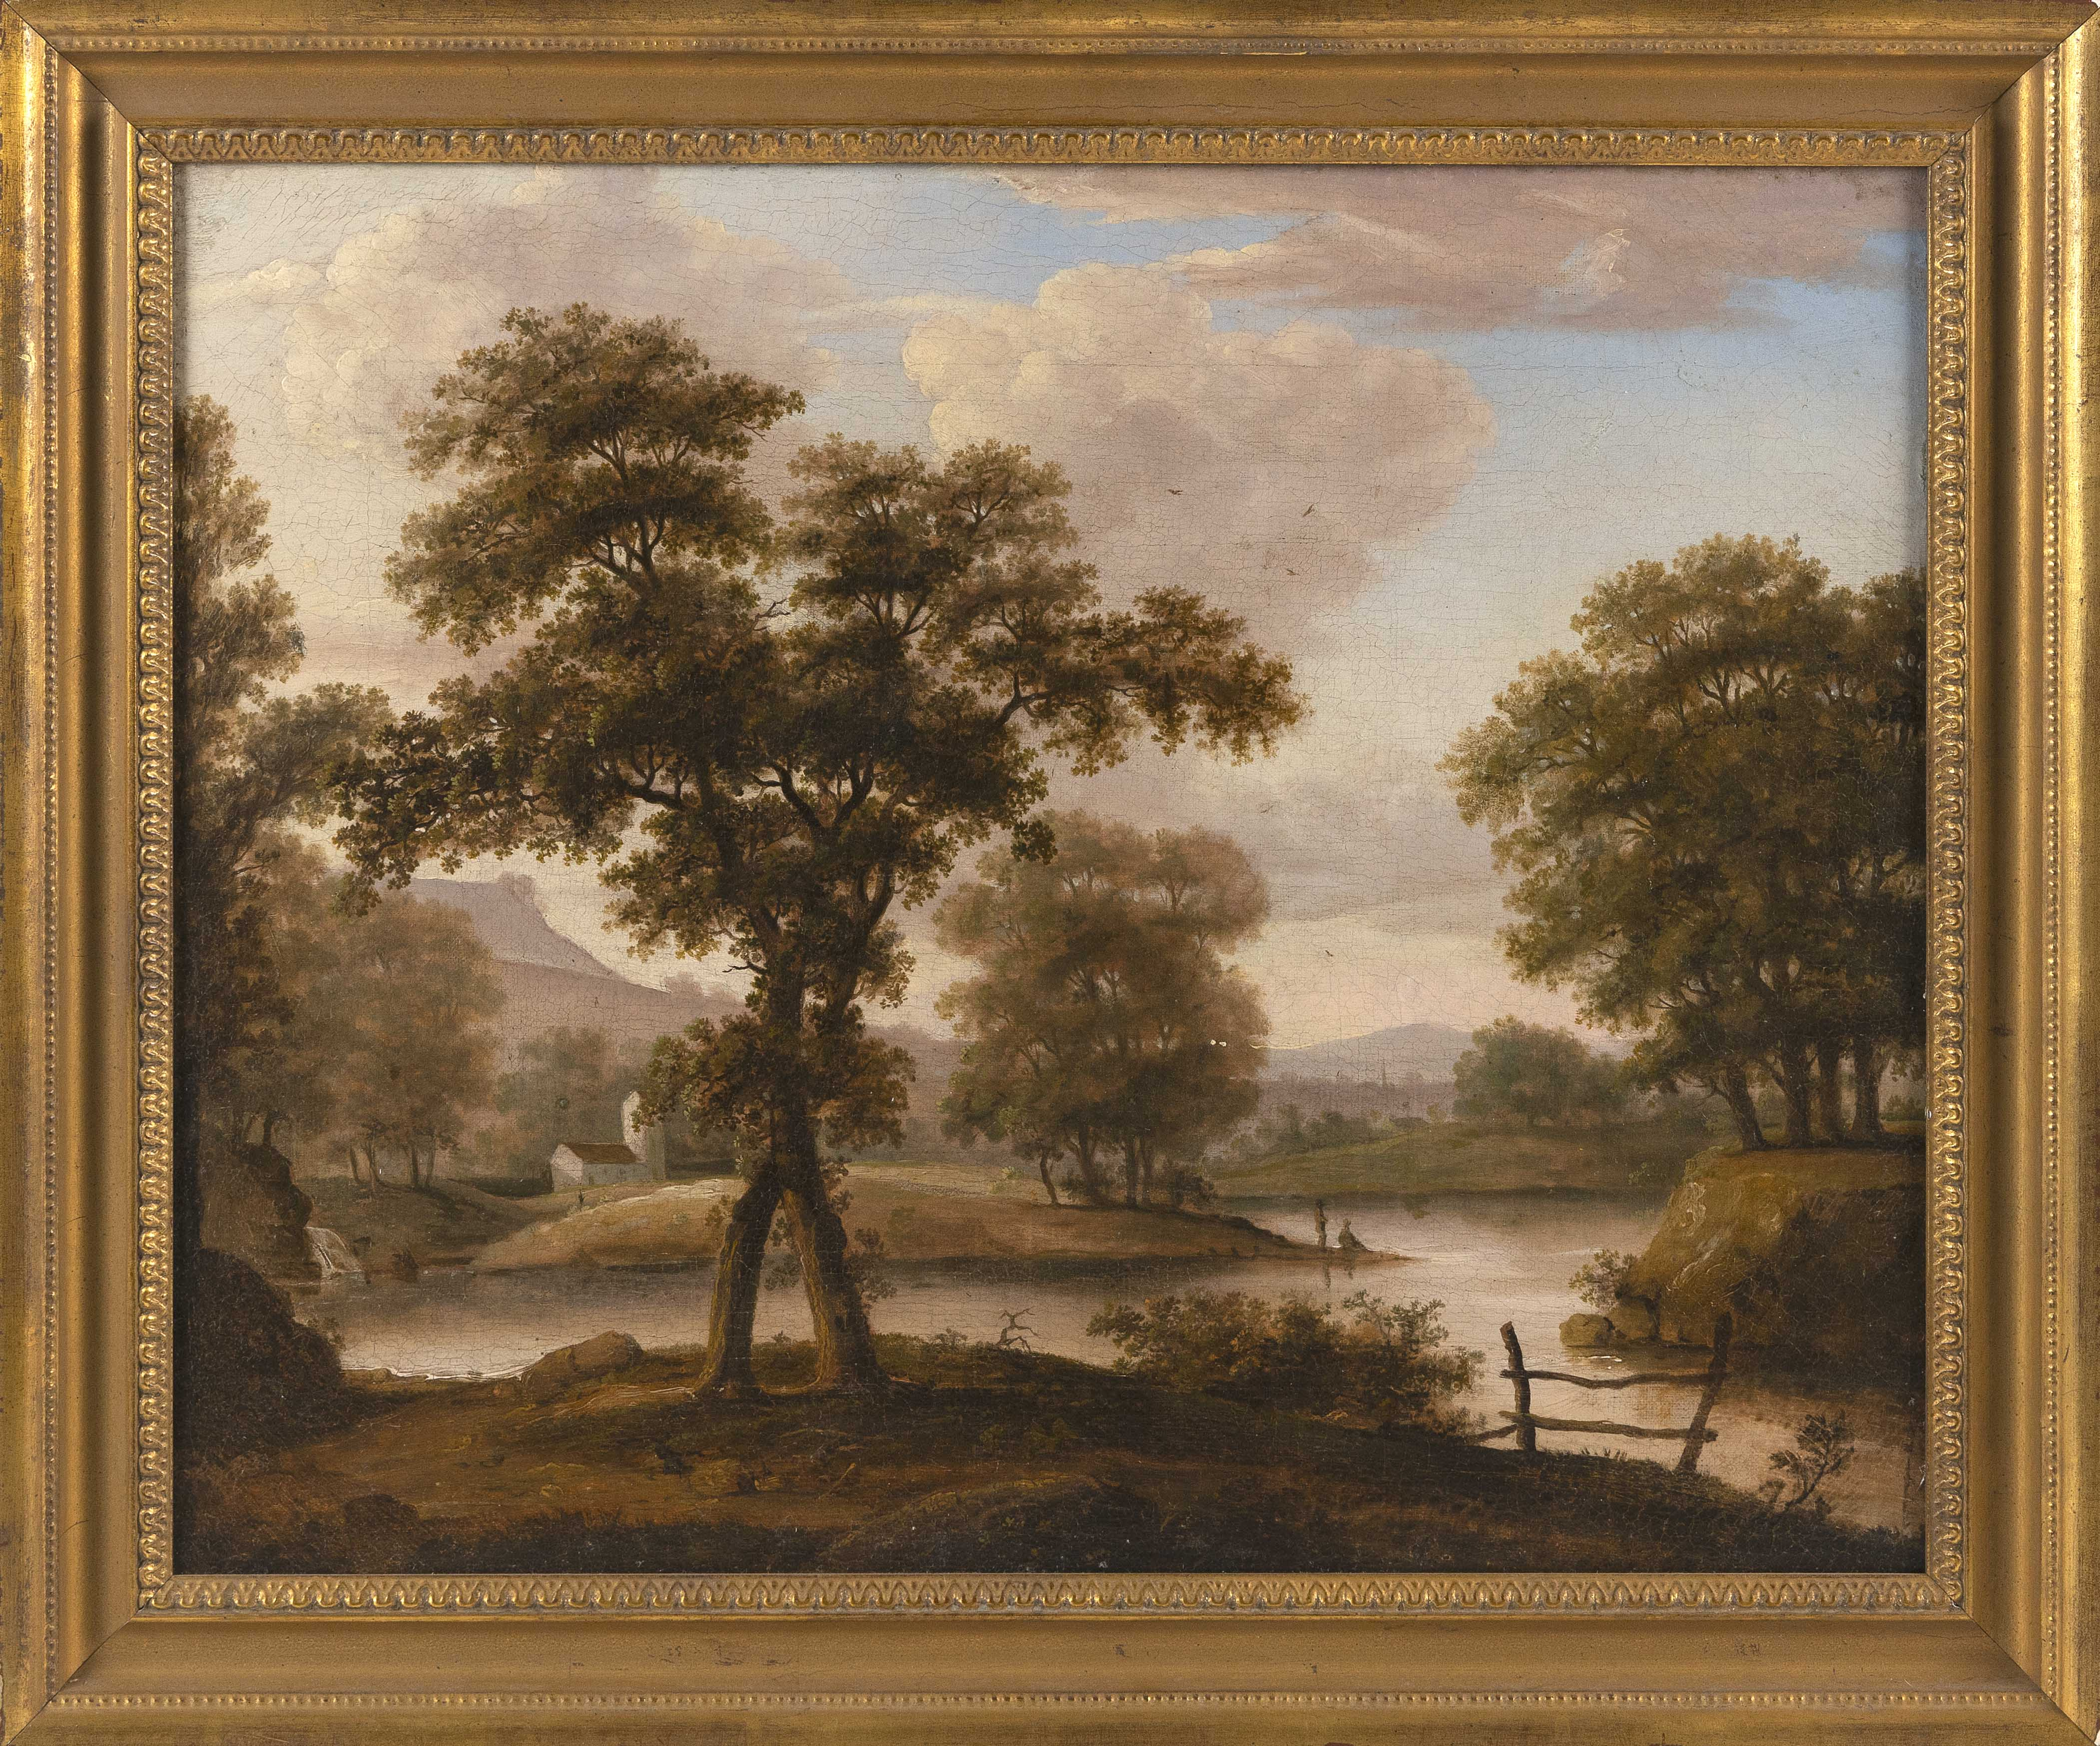 "JOHN SAMUEL BLUNT (New Hampshire/Massachusetts, 1798-1835), New England scenic landscape with travelers., Oil on canvas, 17"" x 21"". Framed 21.5"" x 24.5""."